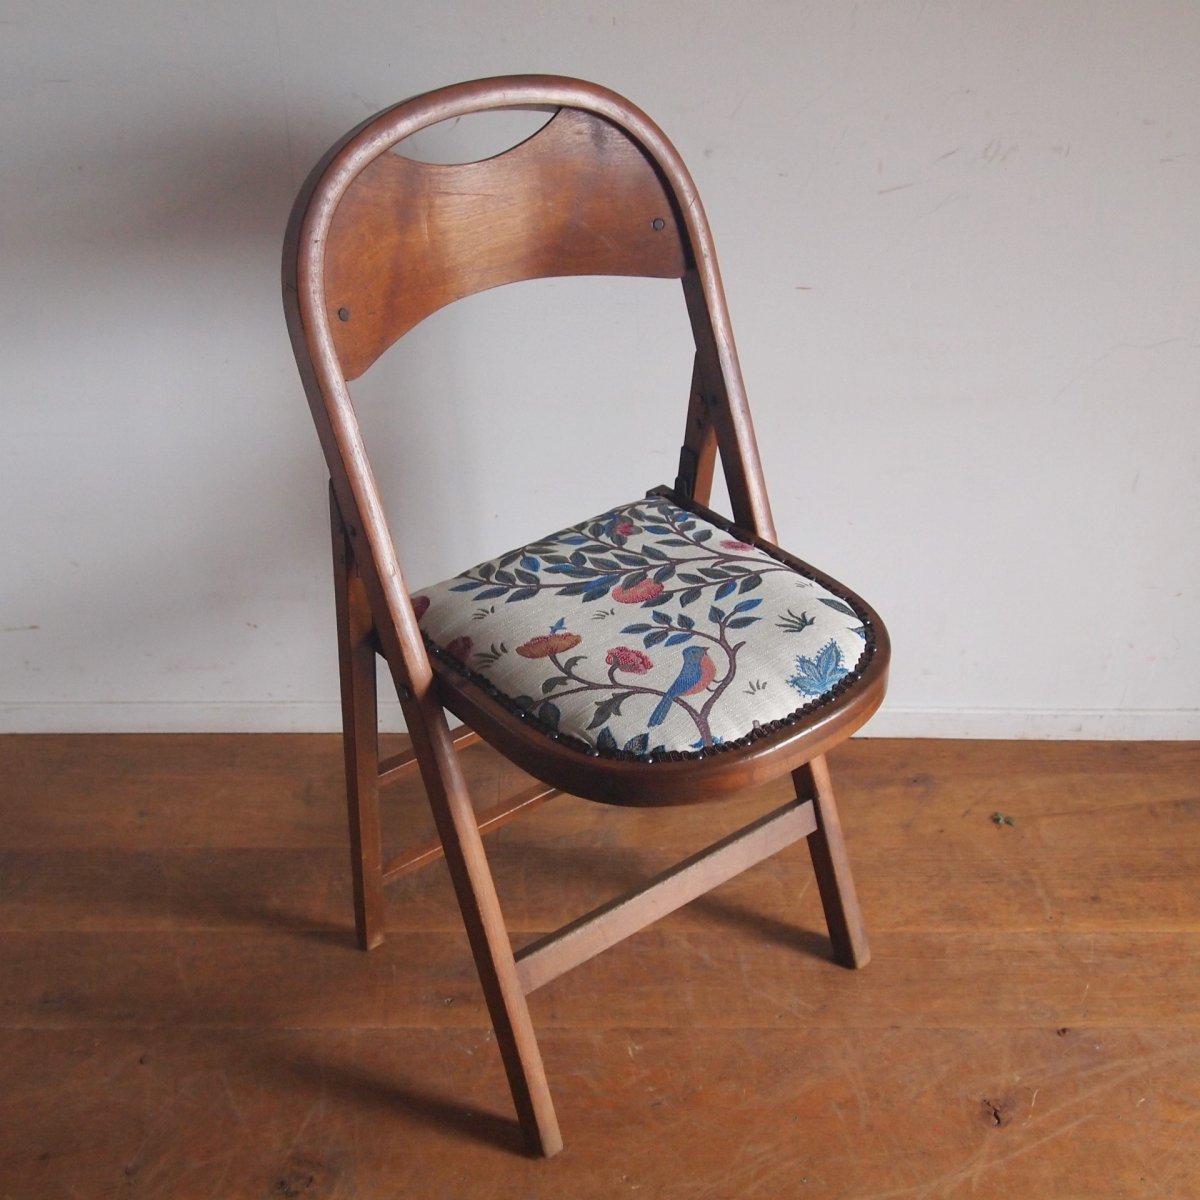 <img class='new_mark_img1' src='https://img.shop-pro.jp/img/new/icons14.gif' style='border:none;display:inline;margin:0px;padding:0px;width:auto;' />折り畳み椅子/William Morris